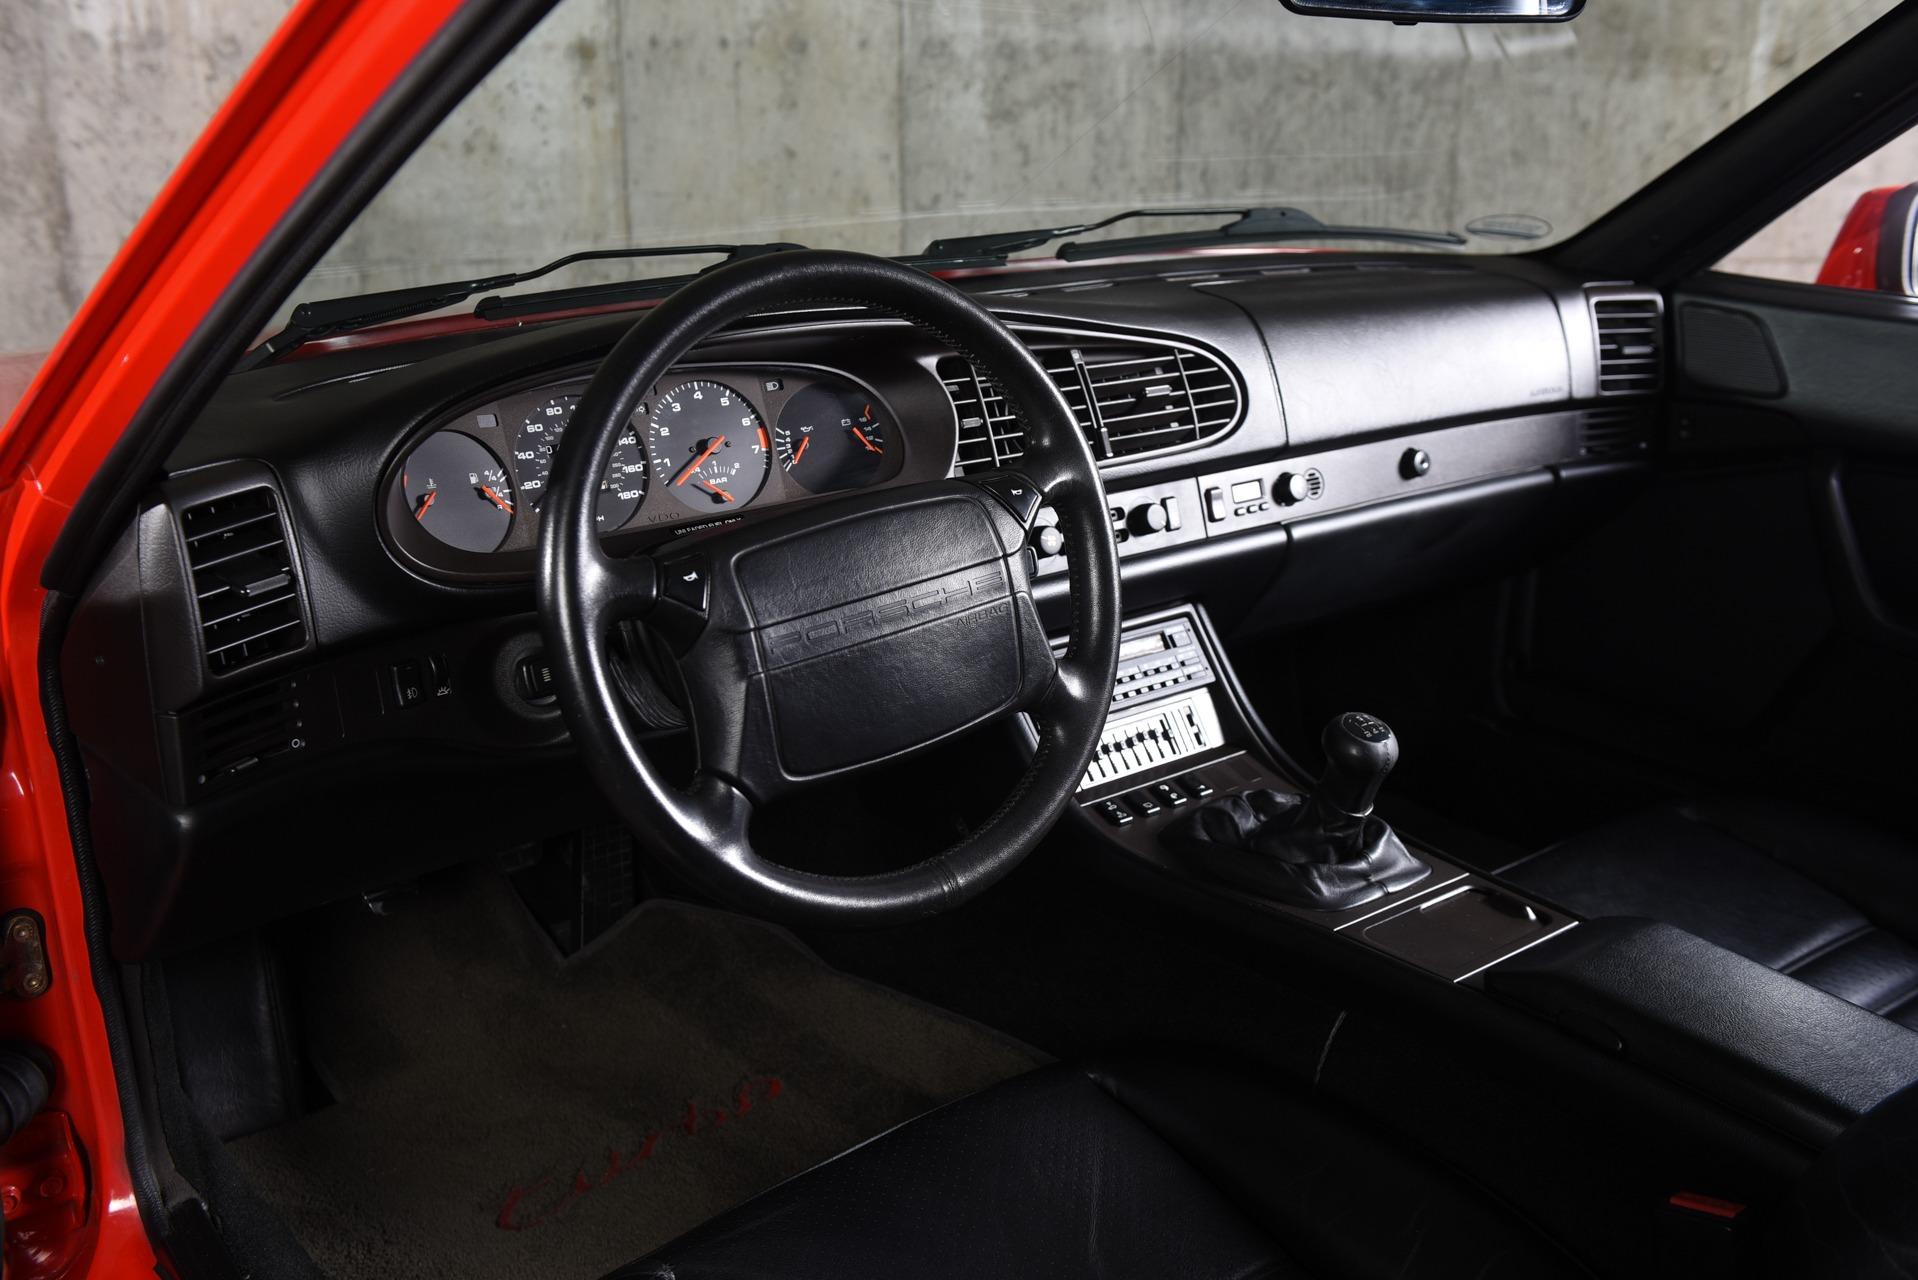 Used 1989 Porsche 944 Turbo | Glen Cove, NY